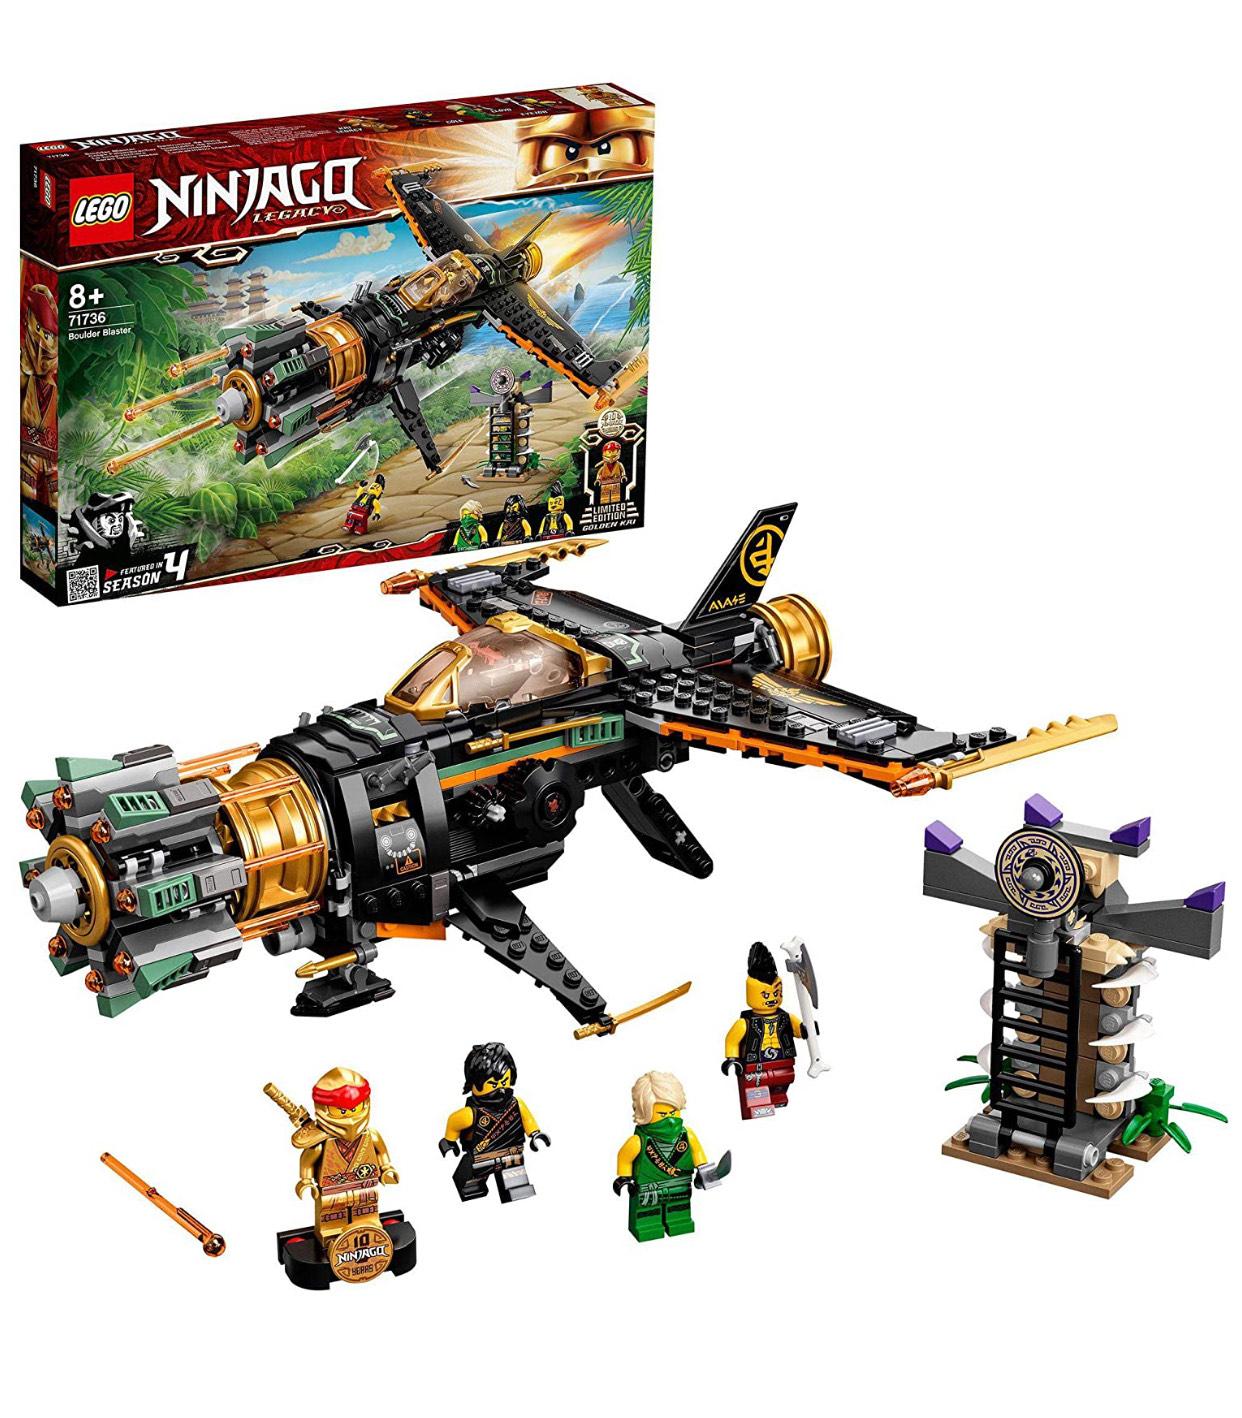 LEGO NINJAGO 71736 Legacy Boulder Blaster Aeroplane Toy with Prison and Collectible Gold Ninja Kai Figure - £27.99 at Amazon